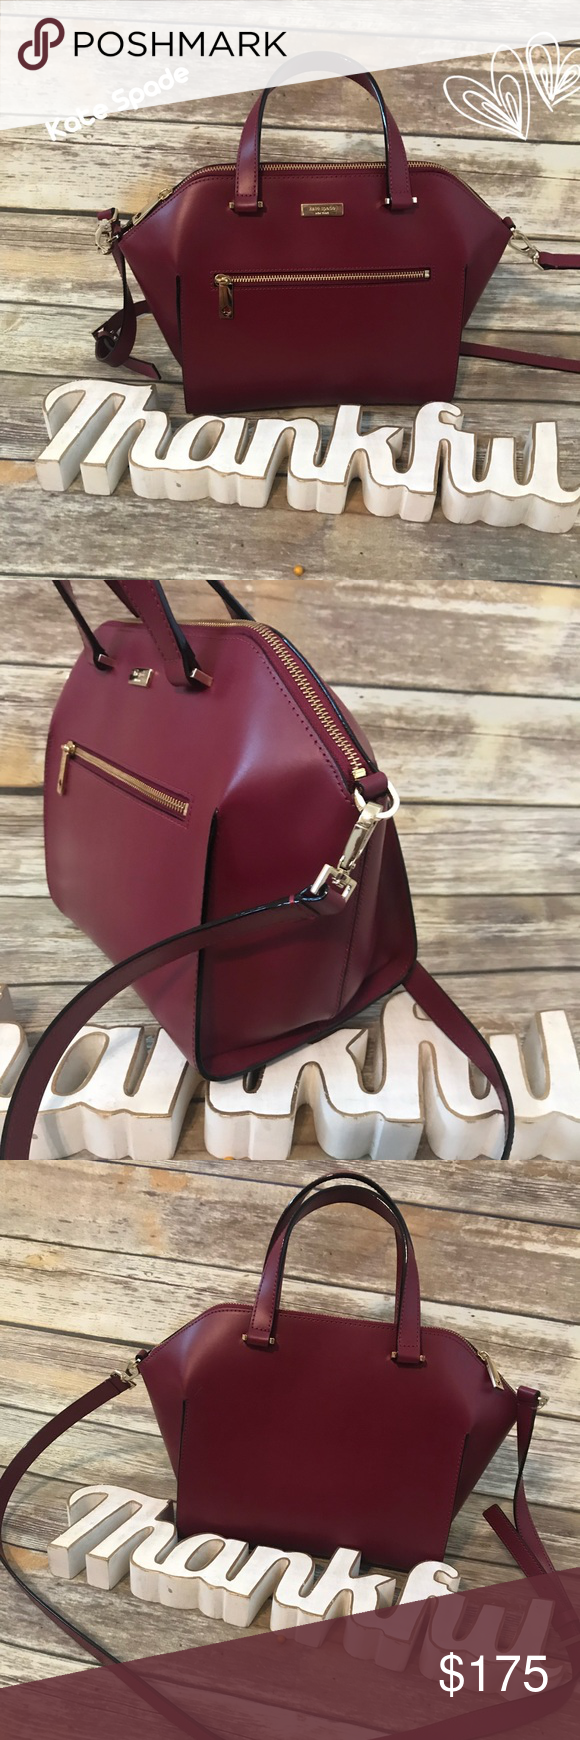 559862de368c Kate Spade Savannah Parliament Square Satchel❤ Beautiful and roomy bag Top  zipped closure smooth